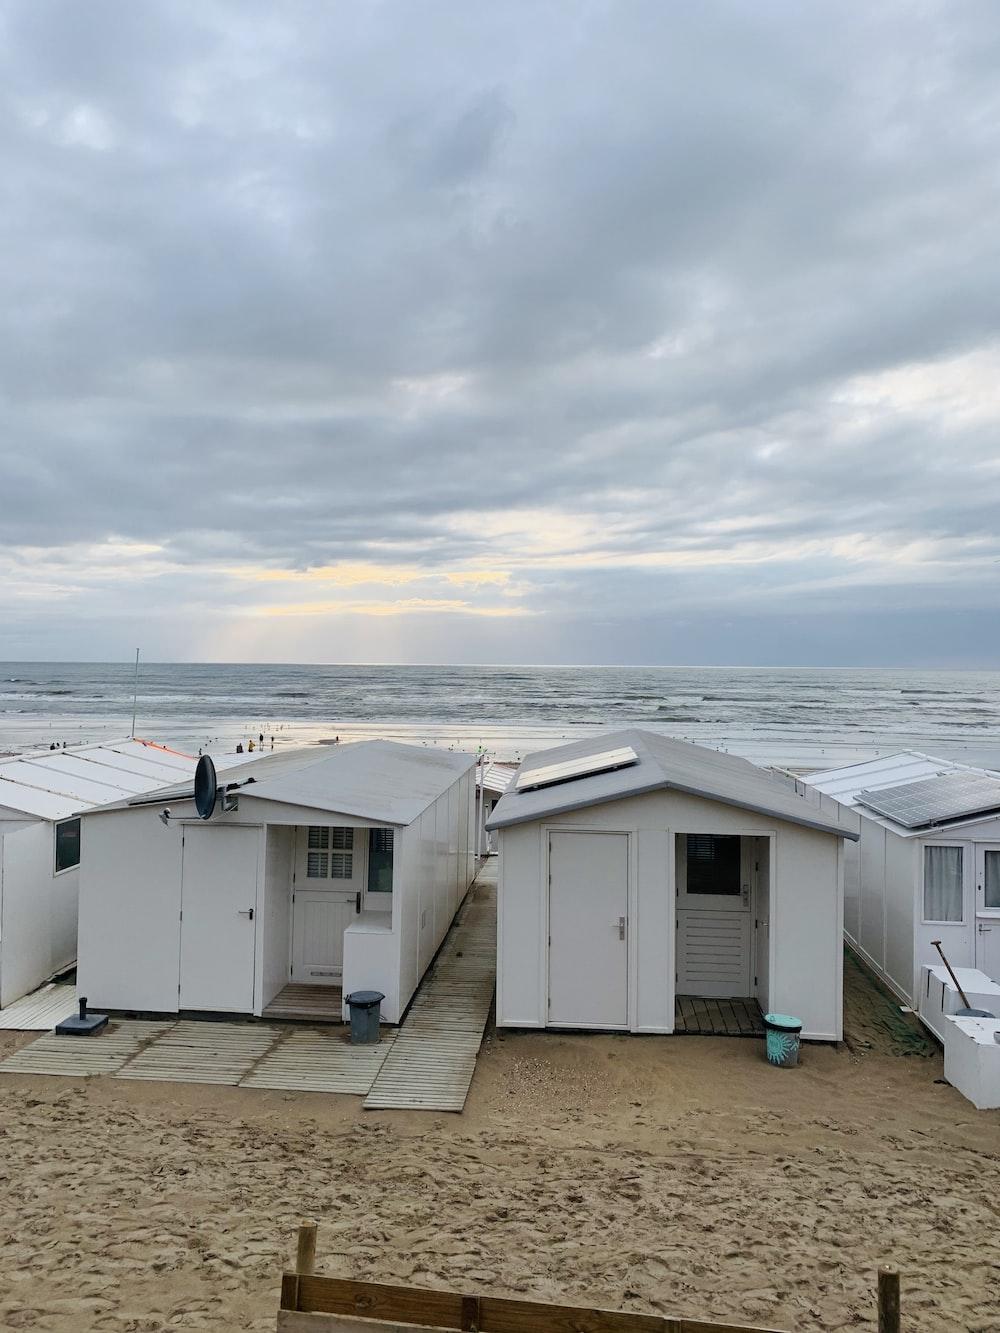 white houses near ocean under cloudy sky